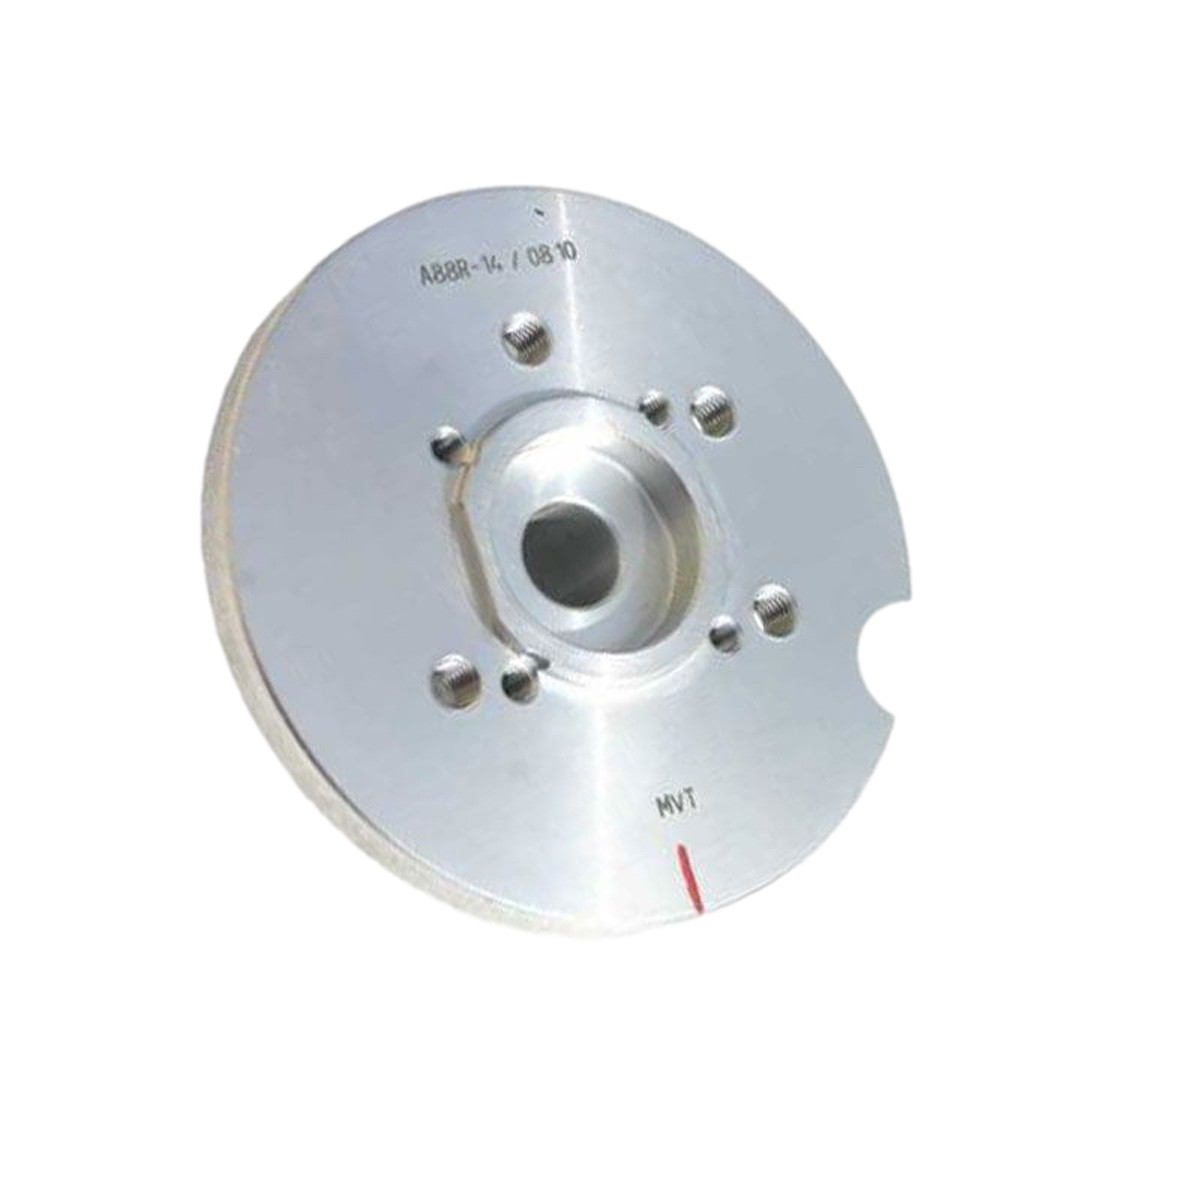 Rotor Allumage MBK Booster - Nitro - MVT Prémium PREM06 PREM19